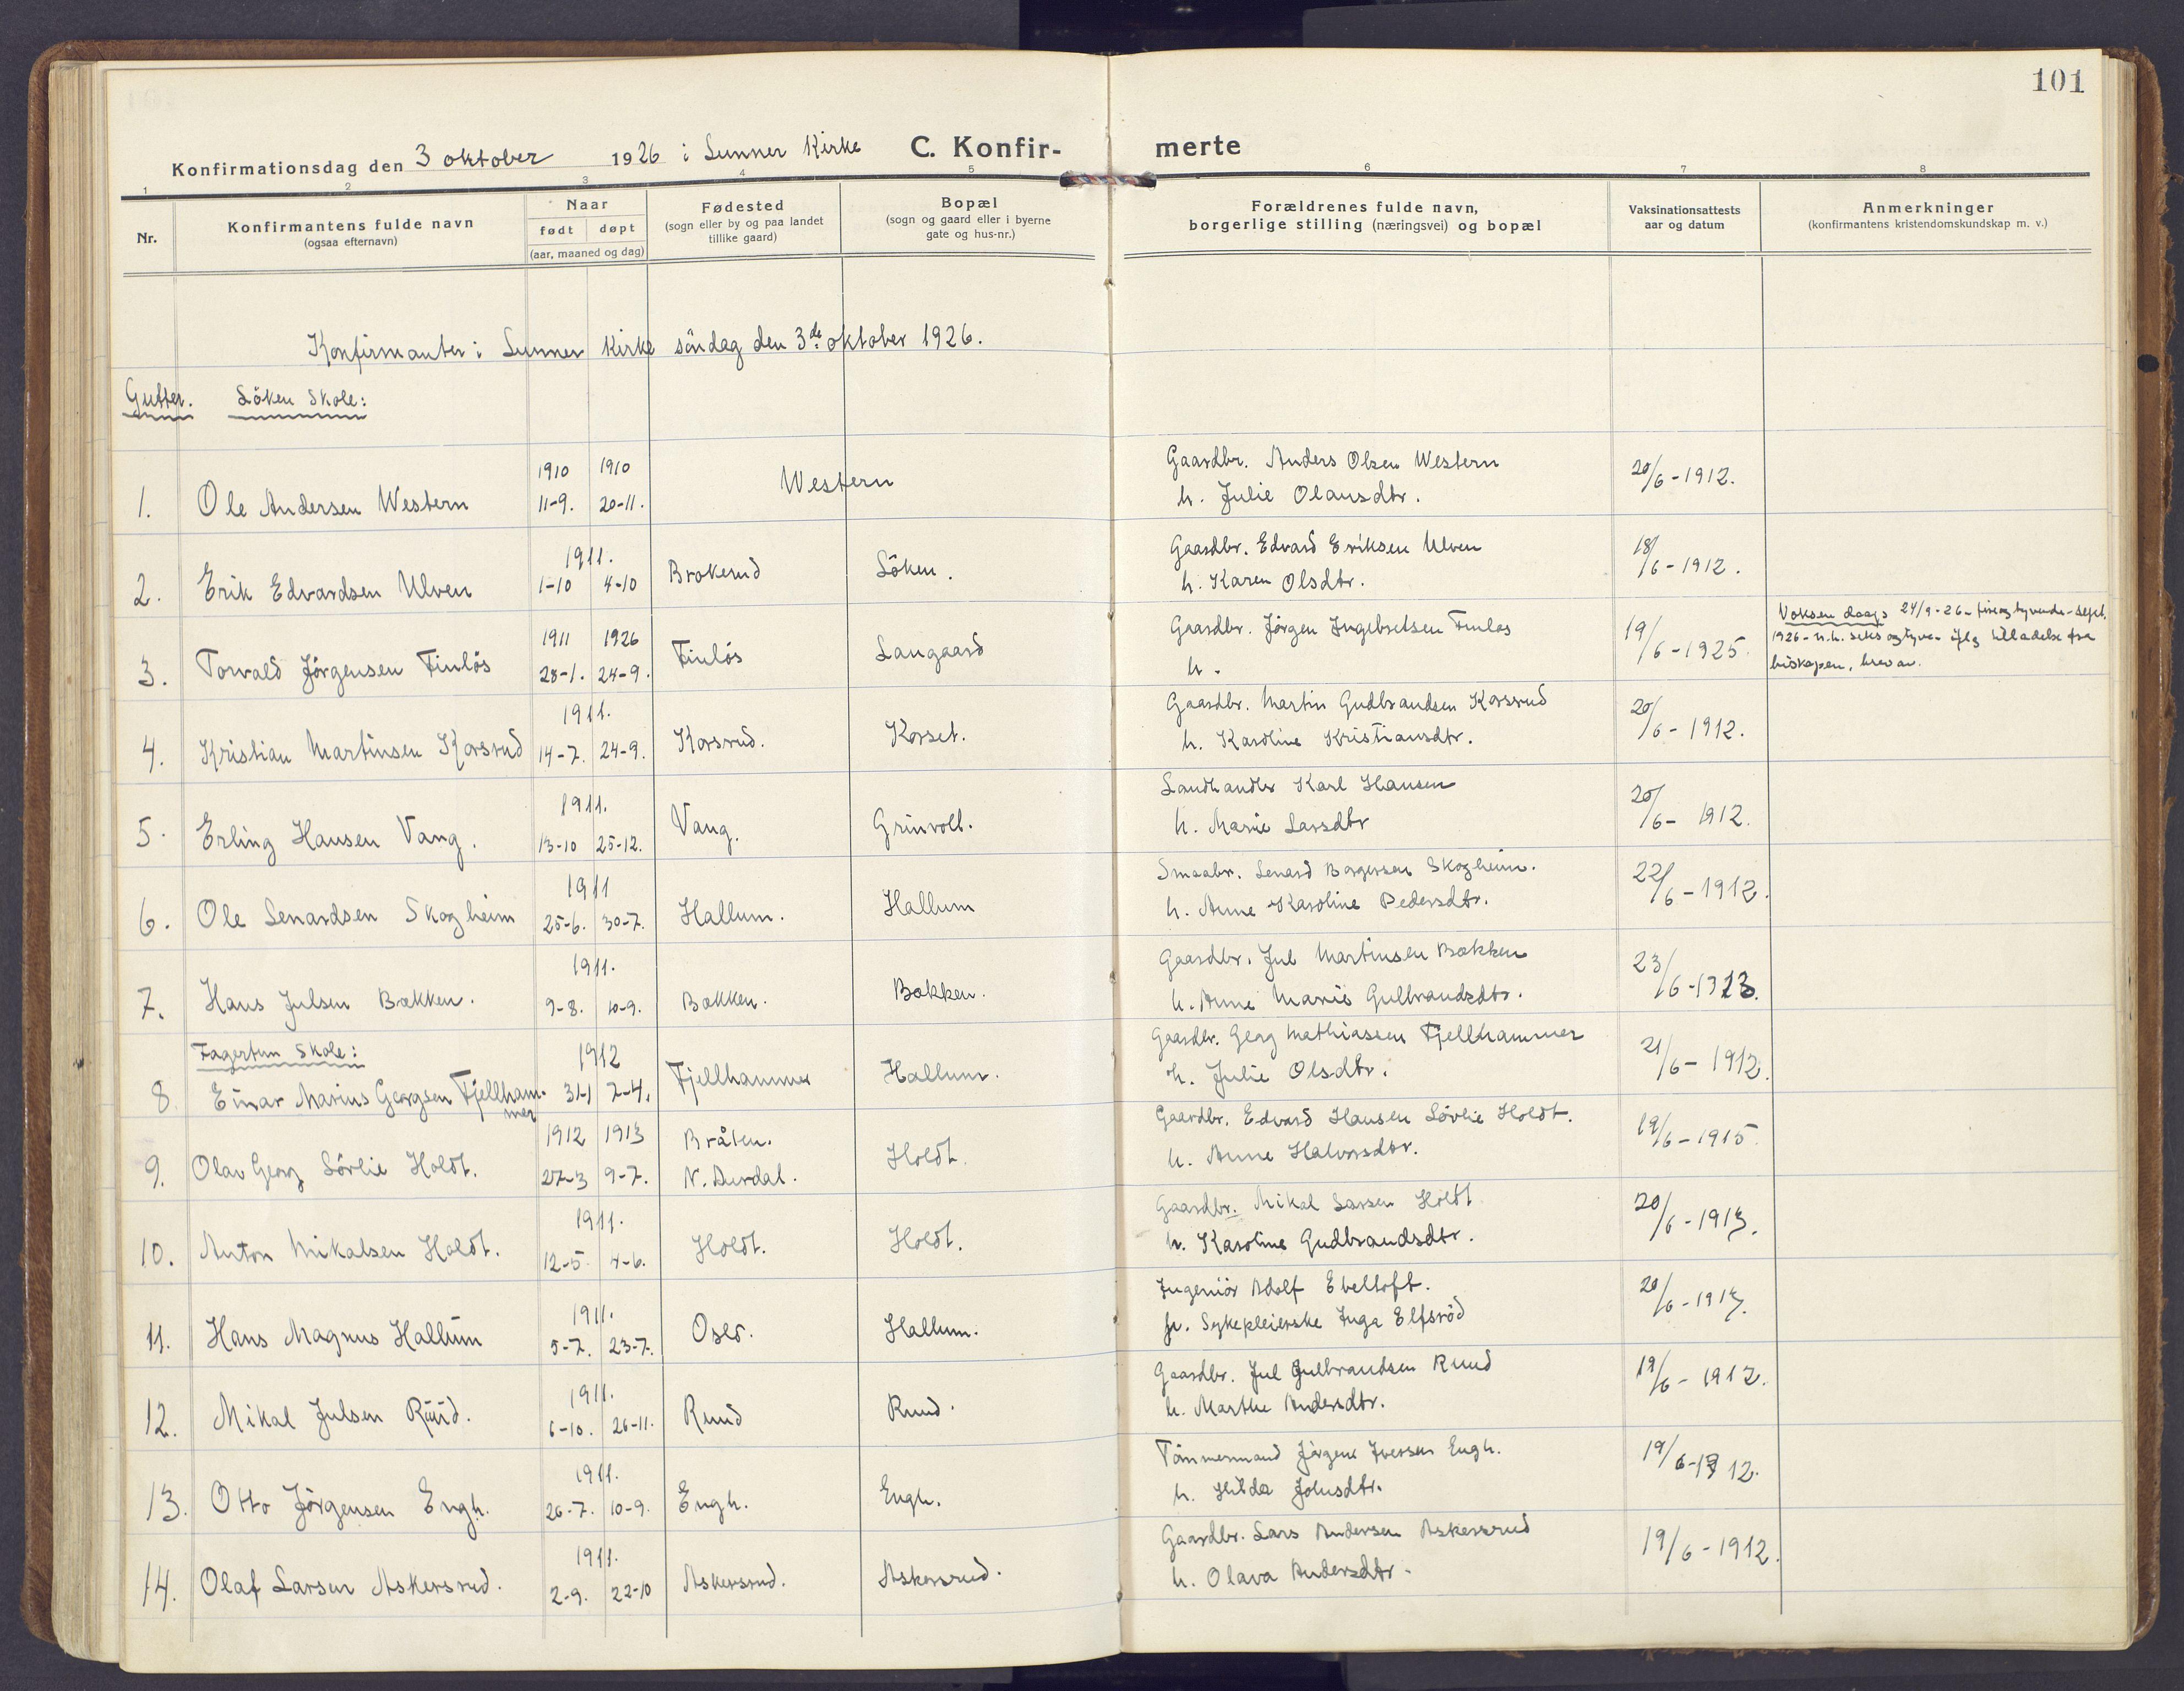 SAH, Lunner prestekontor, H/Ha/Haa/L0002: Ministerialbok nr. 2, 1922-1931, s. 101